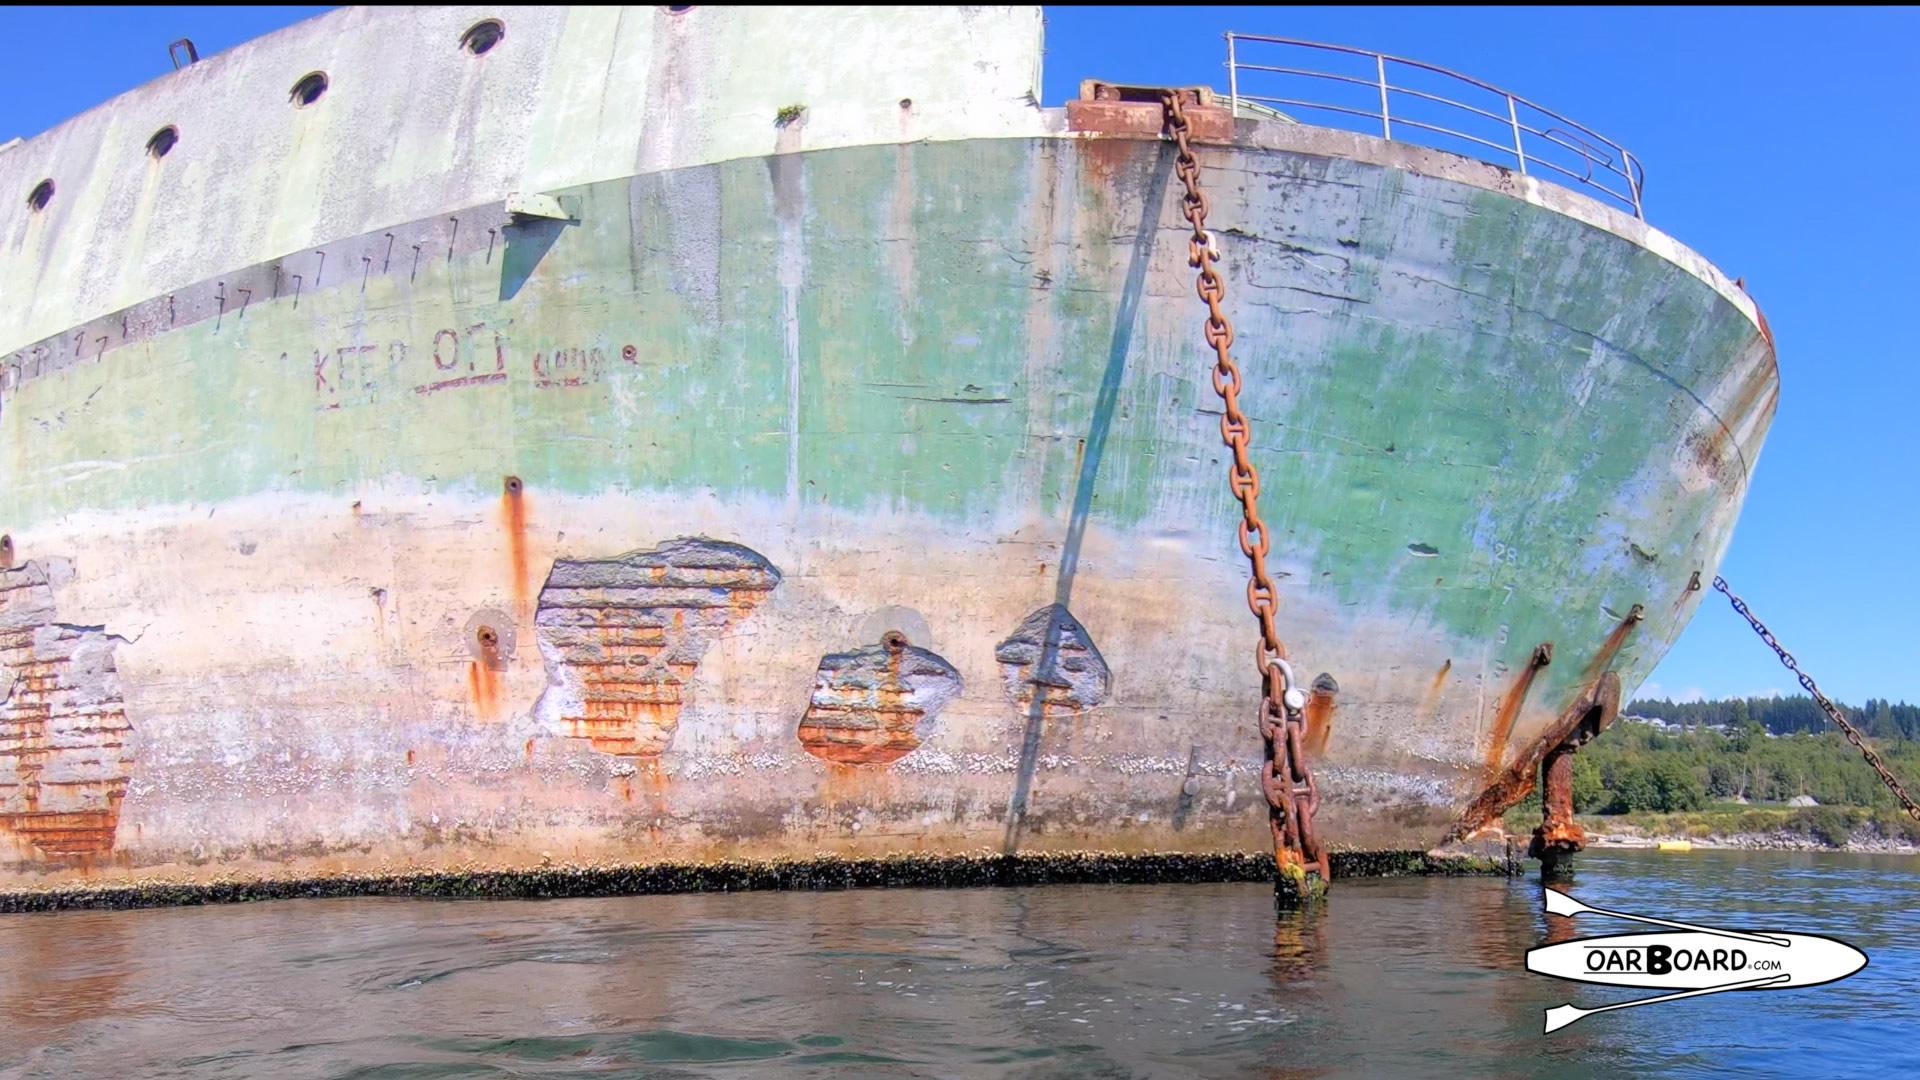 Campbell River Breakwater Rowing, WWII Hulk Ships, Oar Board Stand Up Paddle Boards